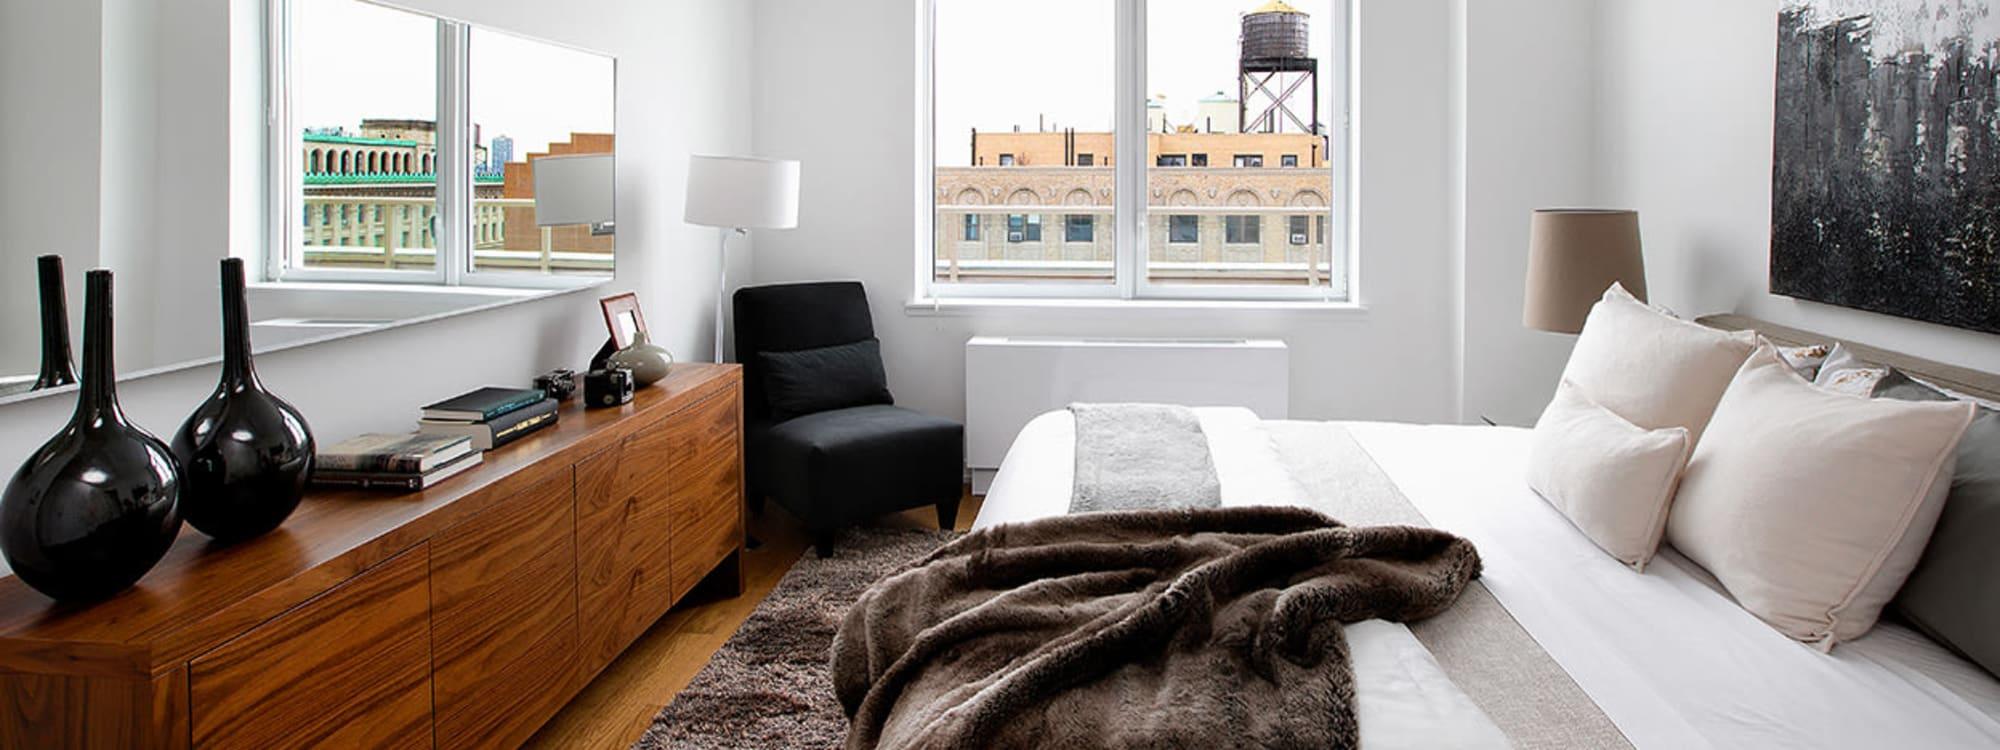 Residences at The Larstrand in New York, New York